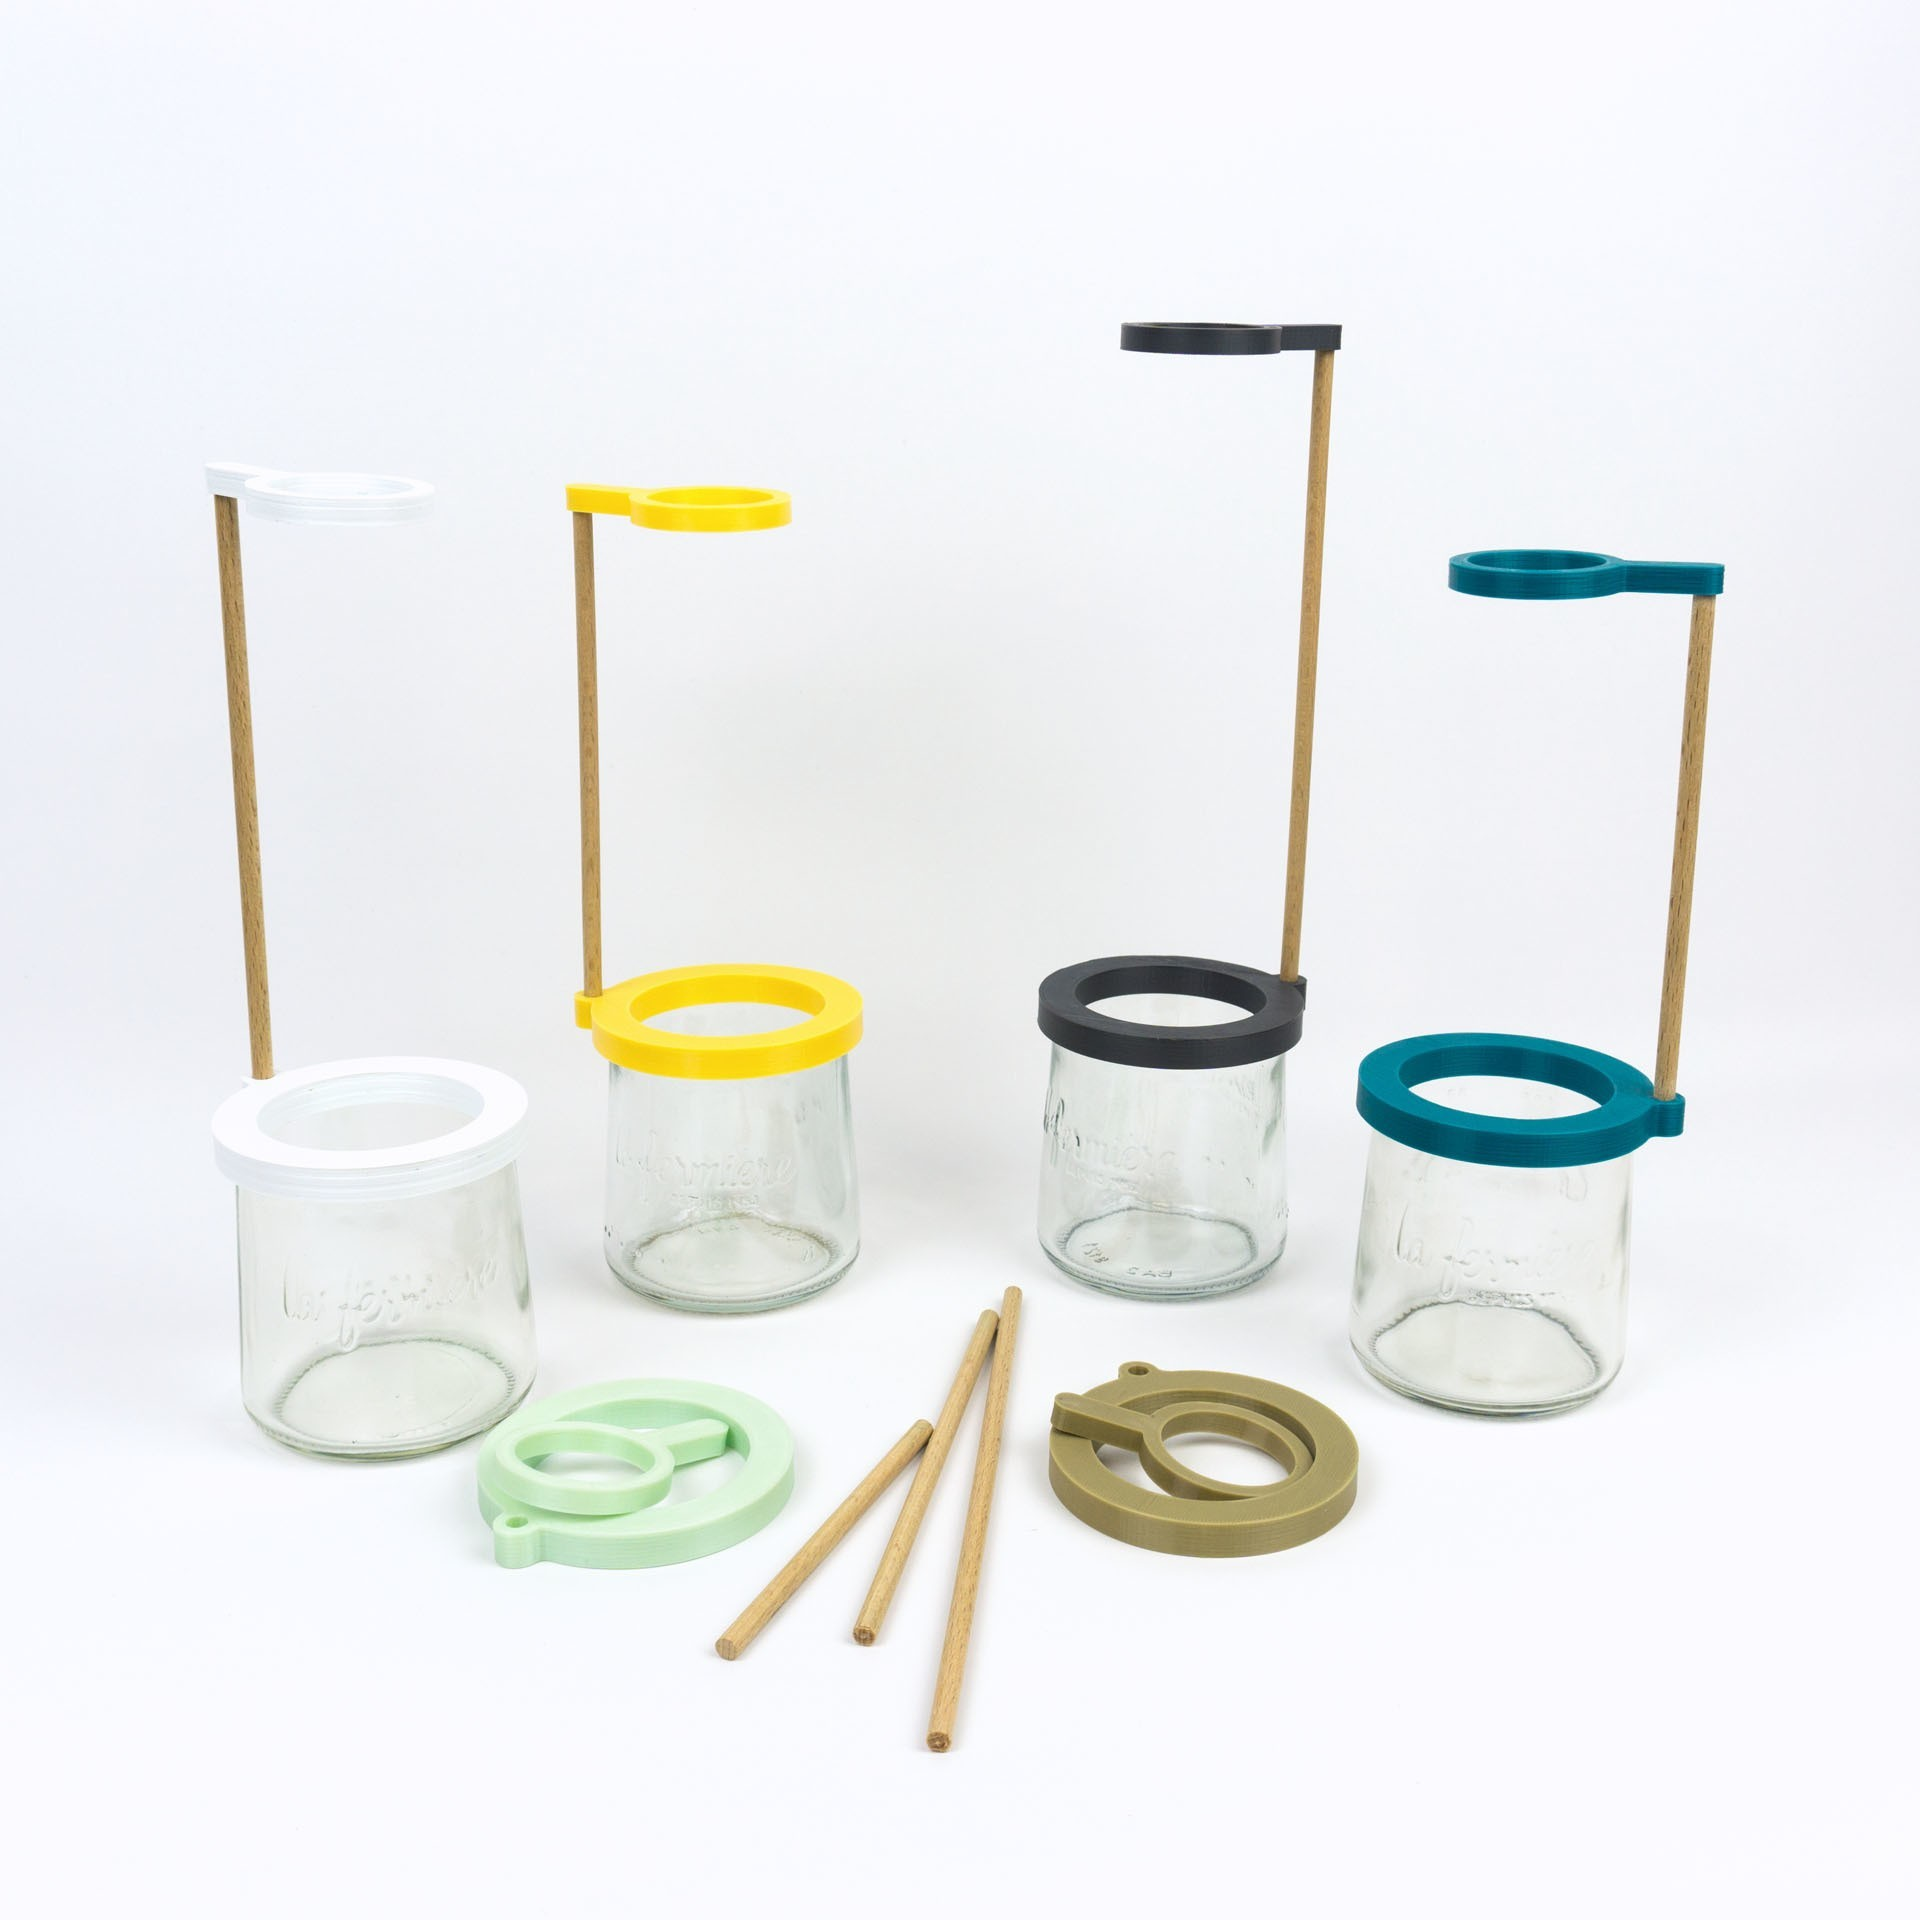 Shooting Pots et impression 3D - 2018 02 10 - 13.jpg Download STL file Stem vase / Vase to be fixed on a glass pot • 3D print object, Jonathan-AtelierVOUS